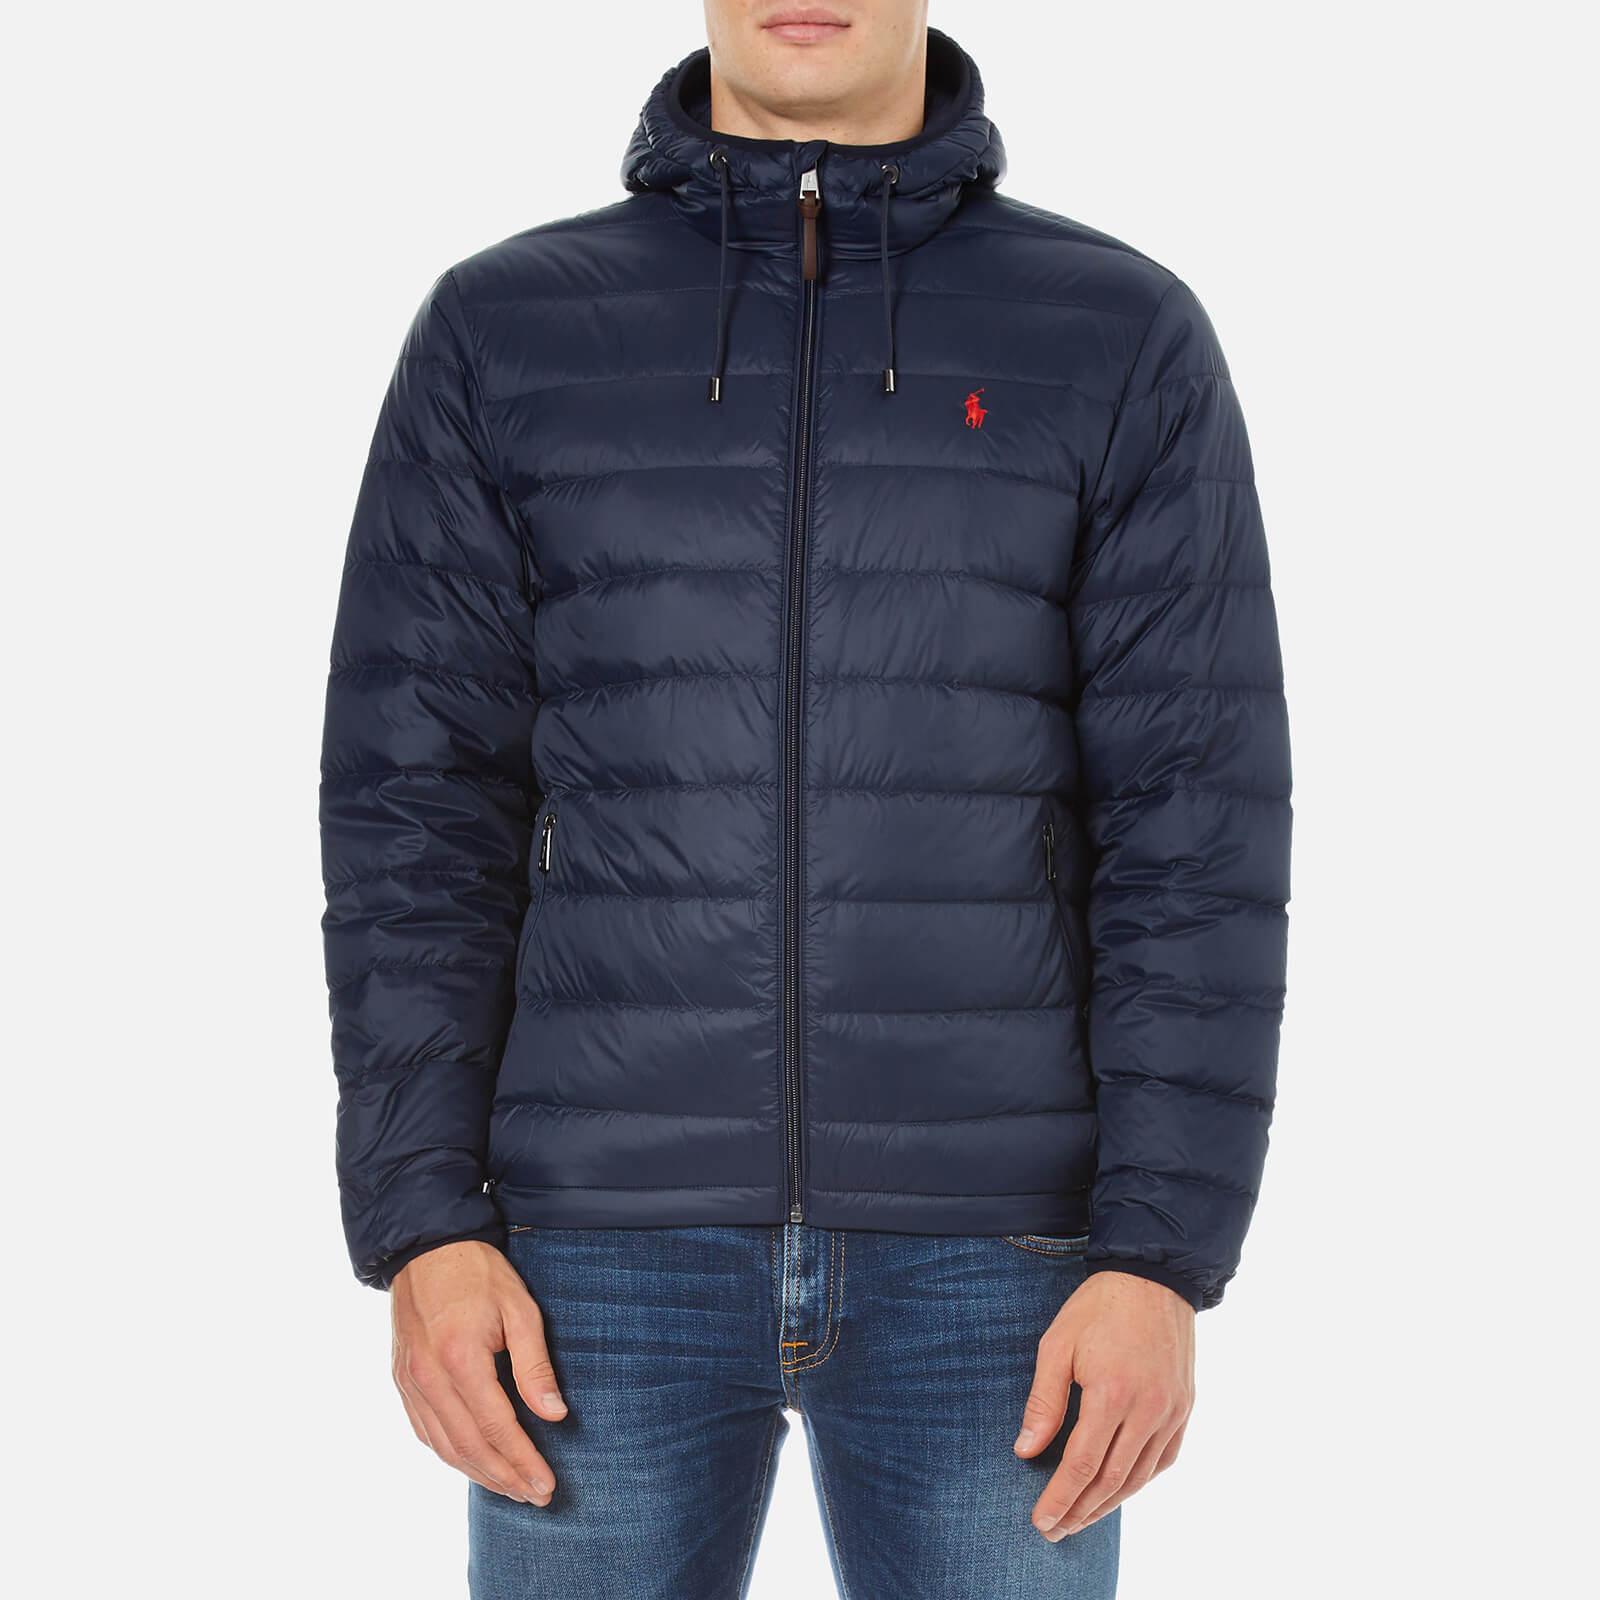 1f6205d52662 Polo Ralph Lauren Men s Core Nylon Packable Down Jacket - Aviator Navy -  Free UK Delivery over £50